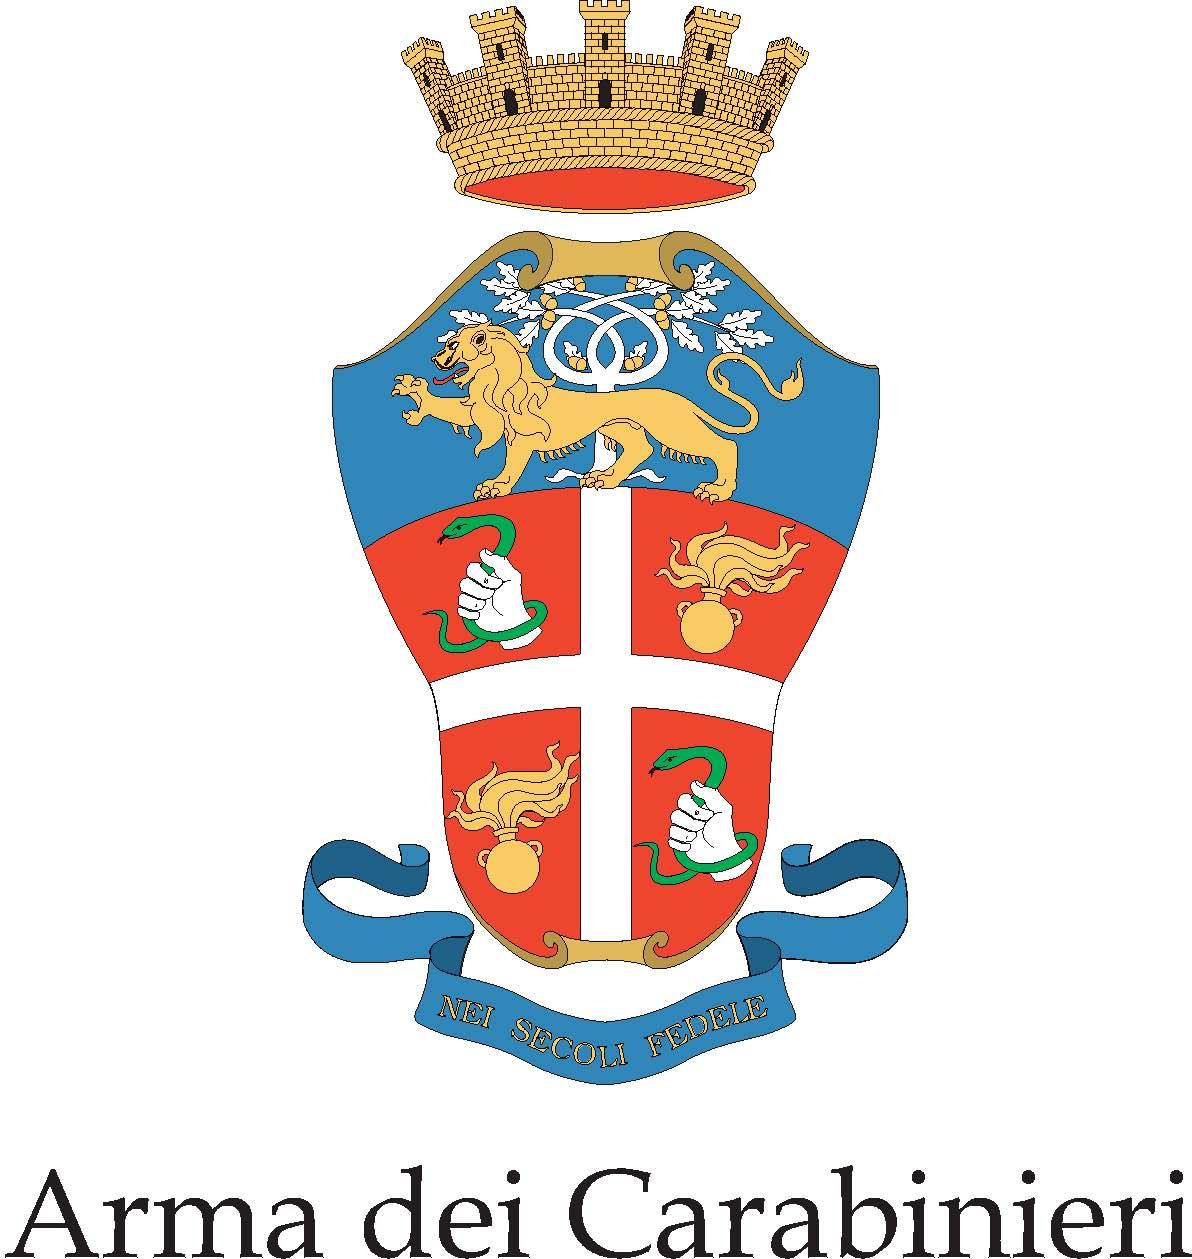 arma dei carabinieri logo